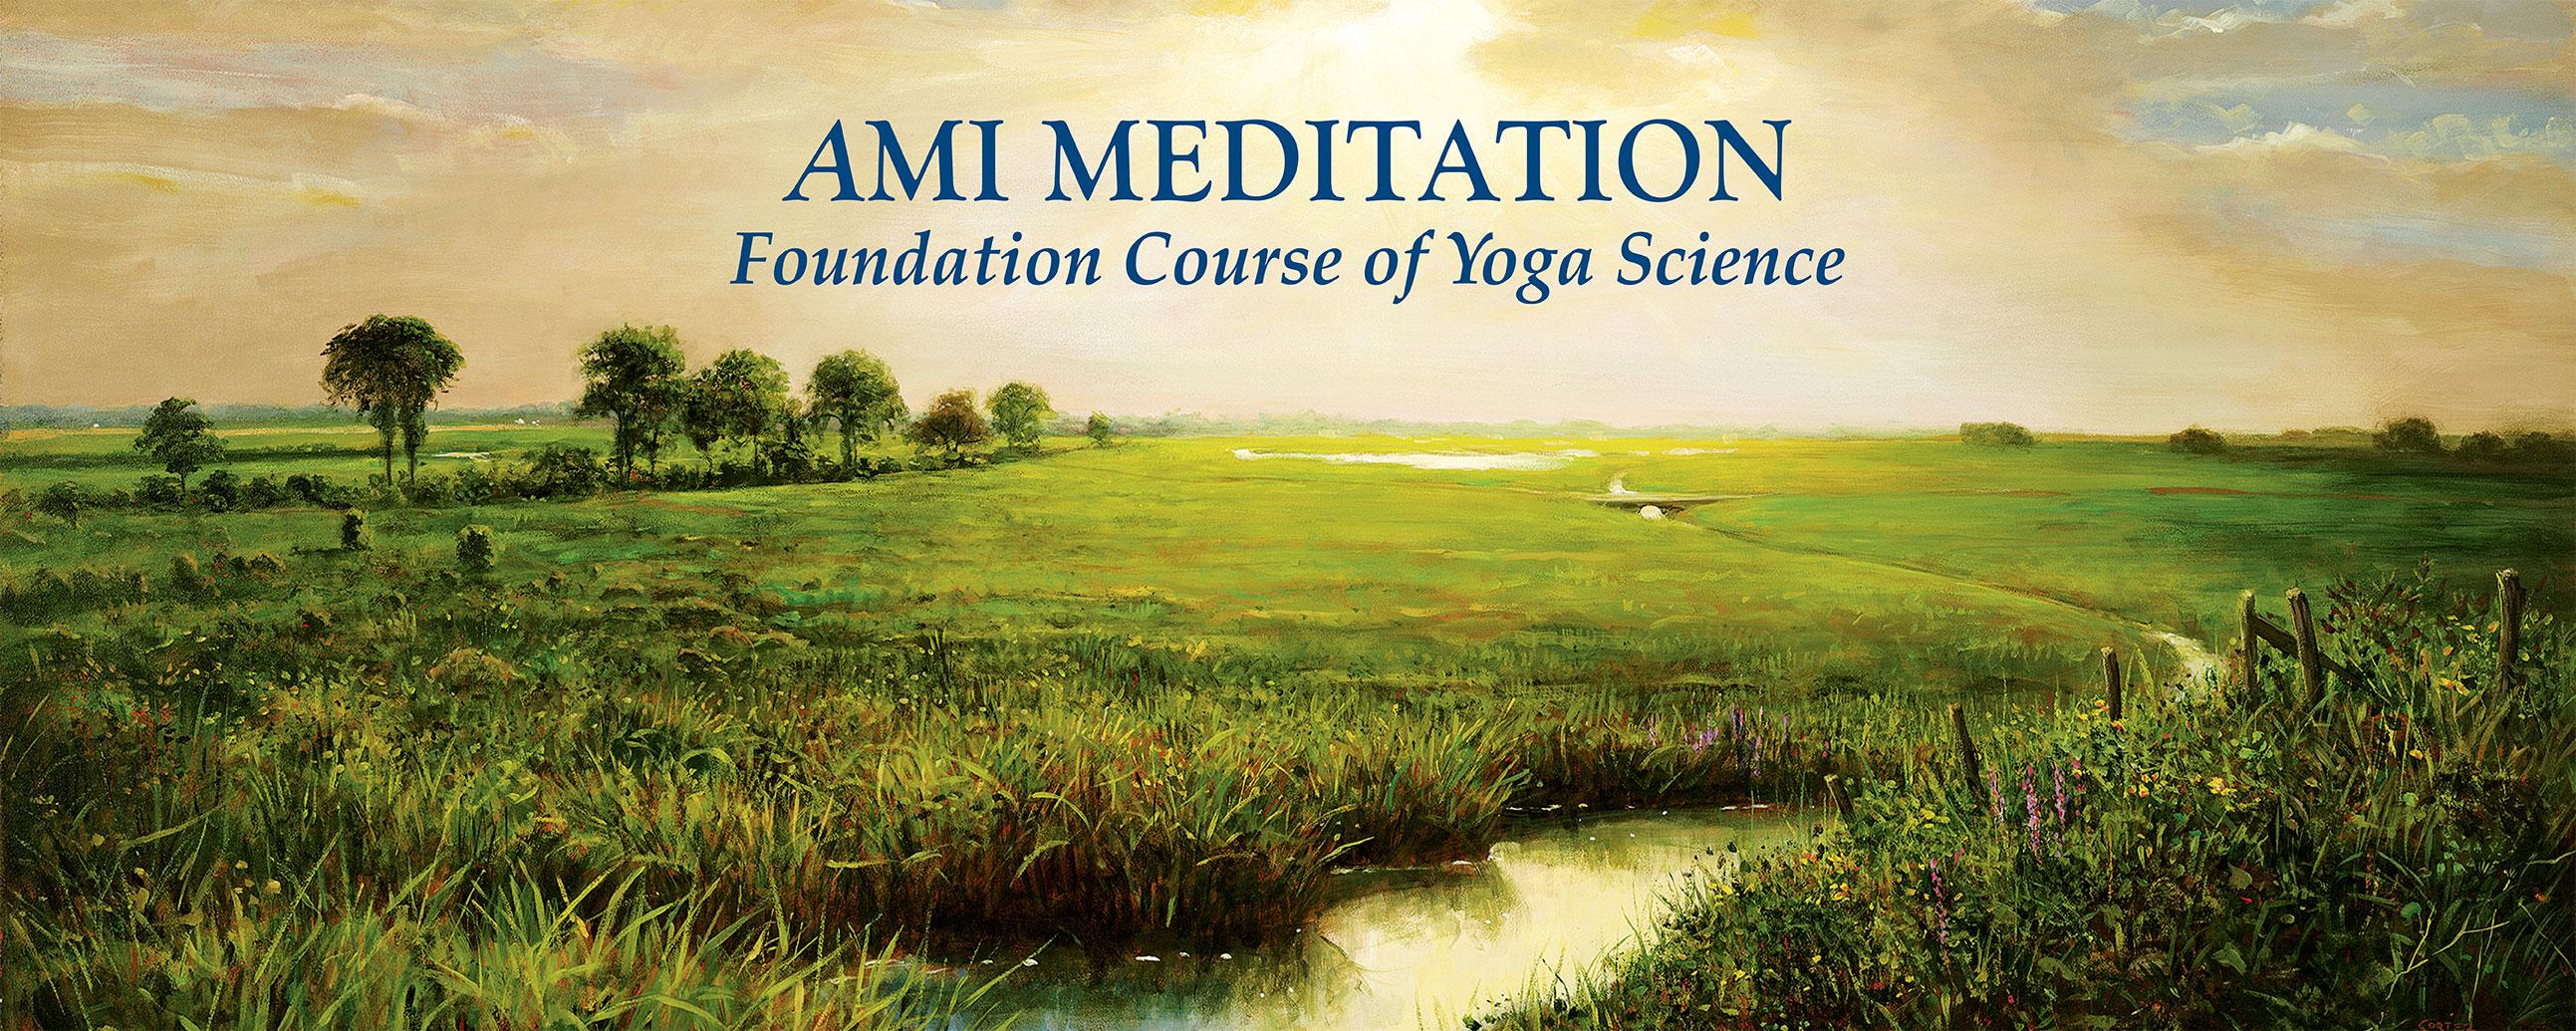 AMI Meditation Foundation Course